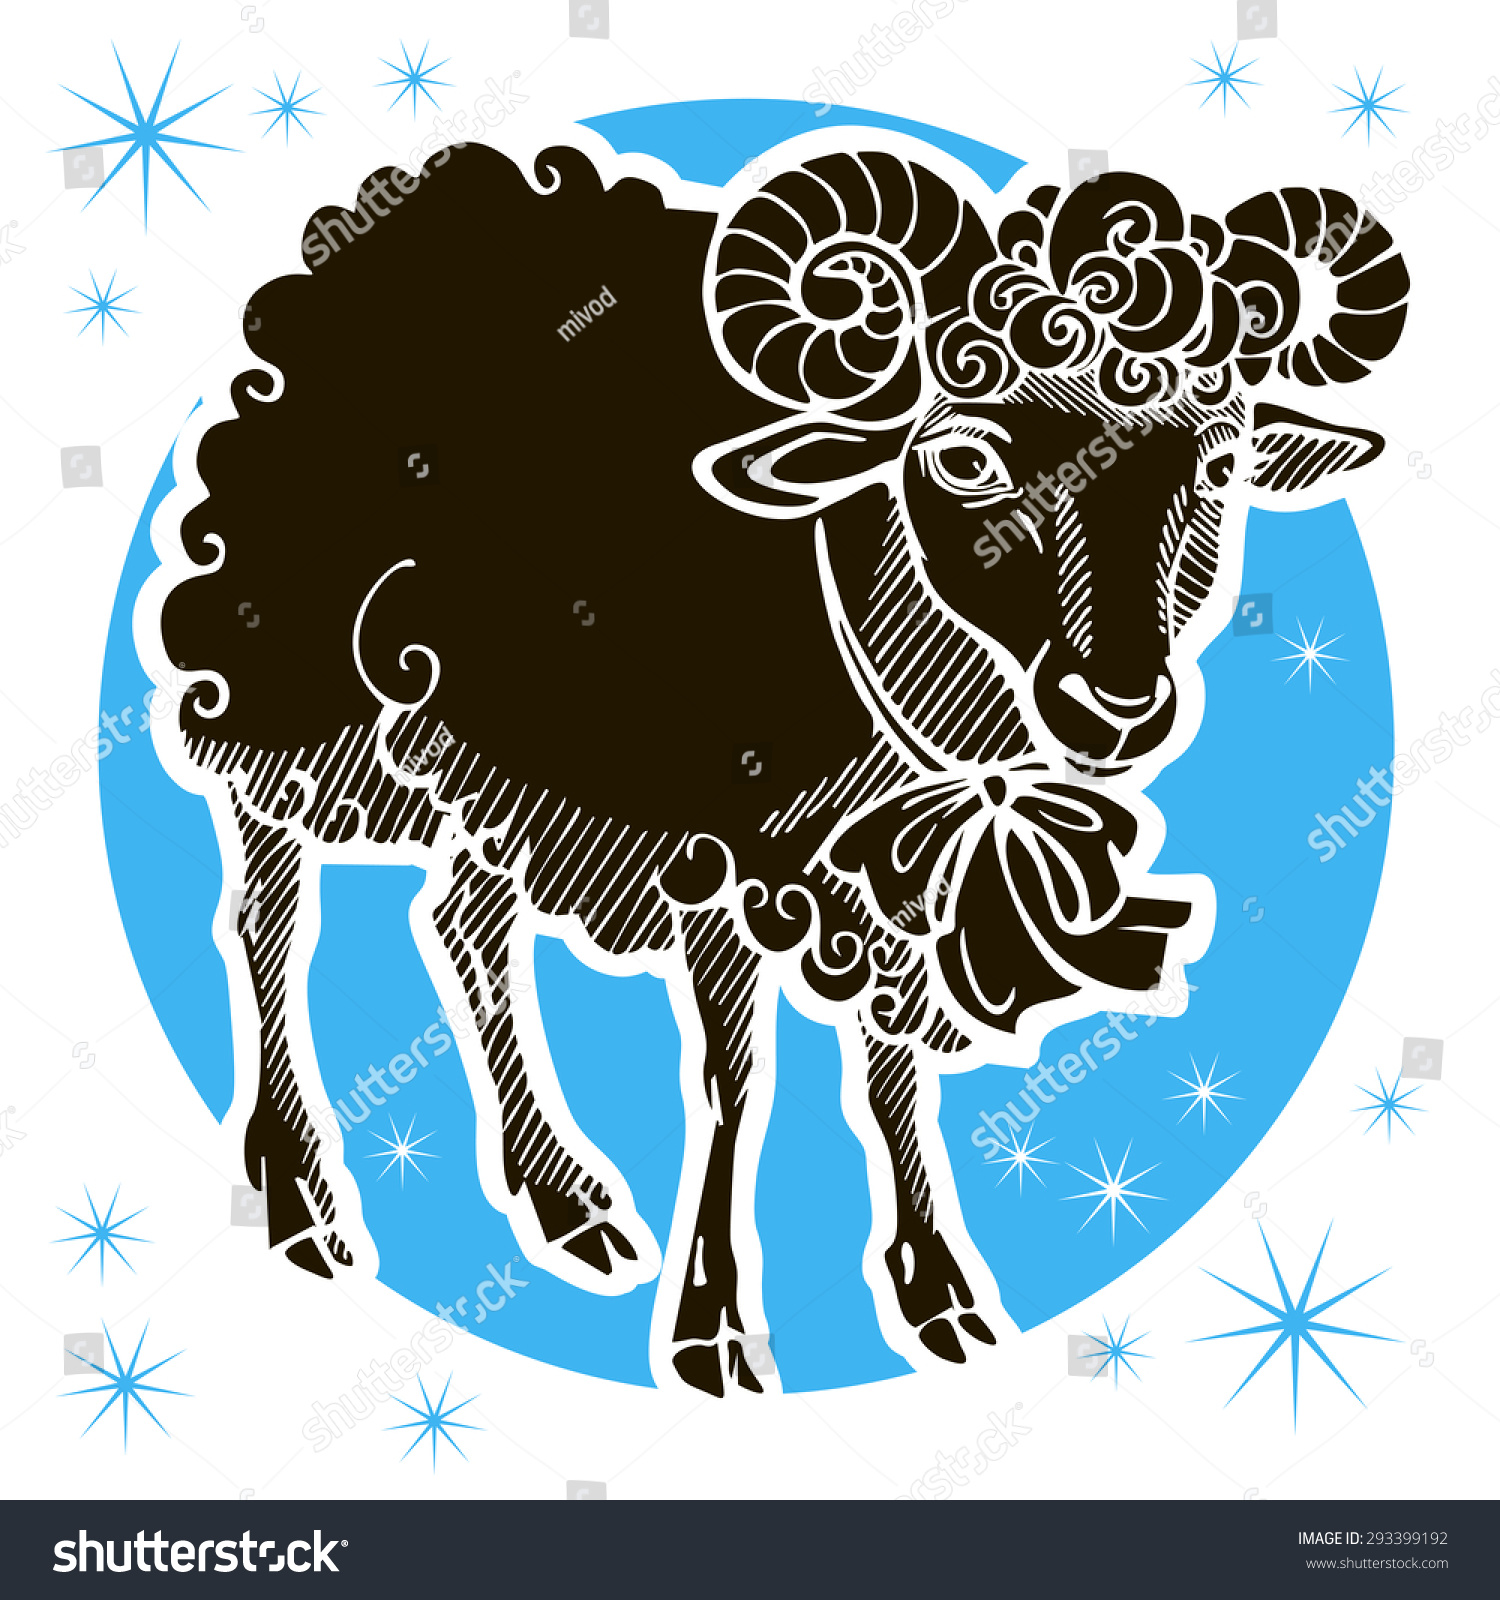 Zodiac signs. Aries is a sheep or a ram